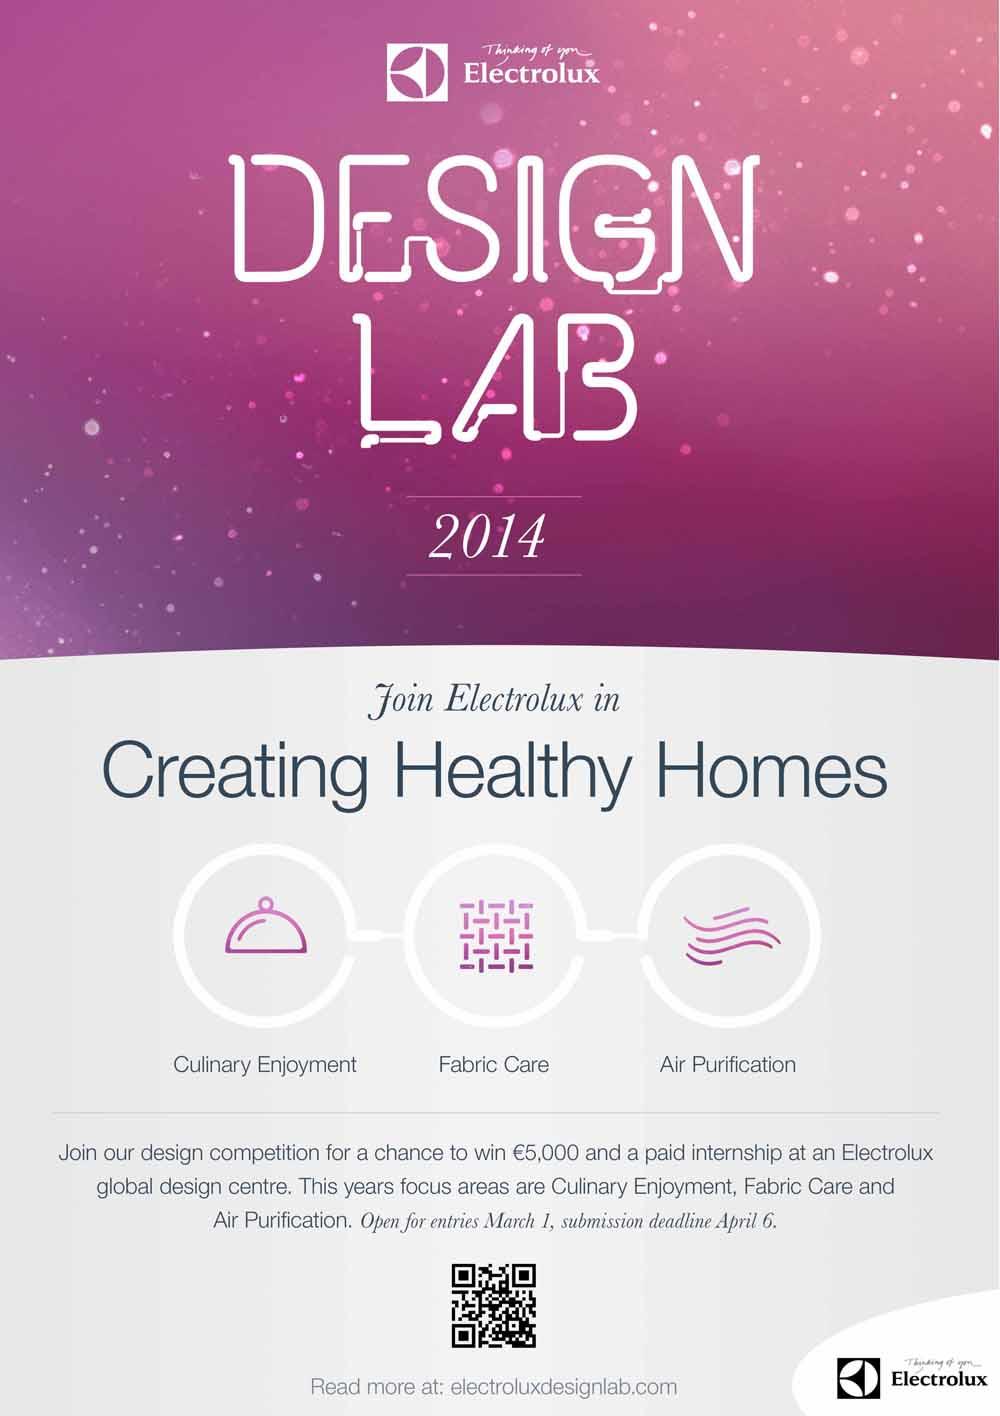 electrolux_design_lab_2014_01